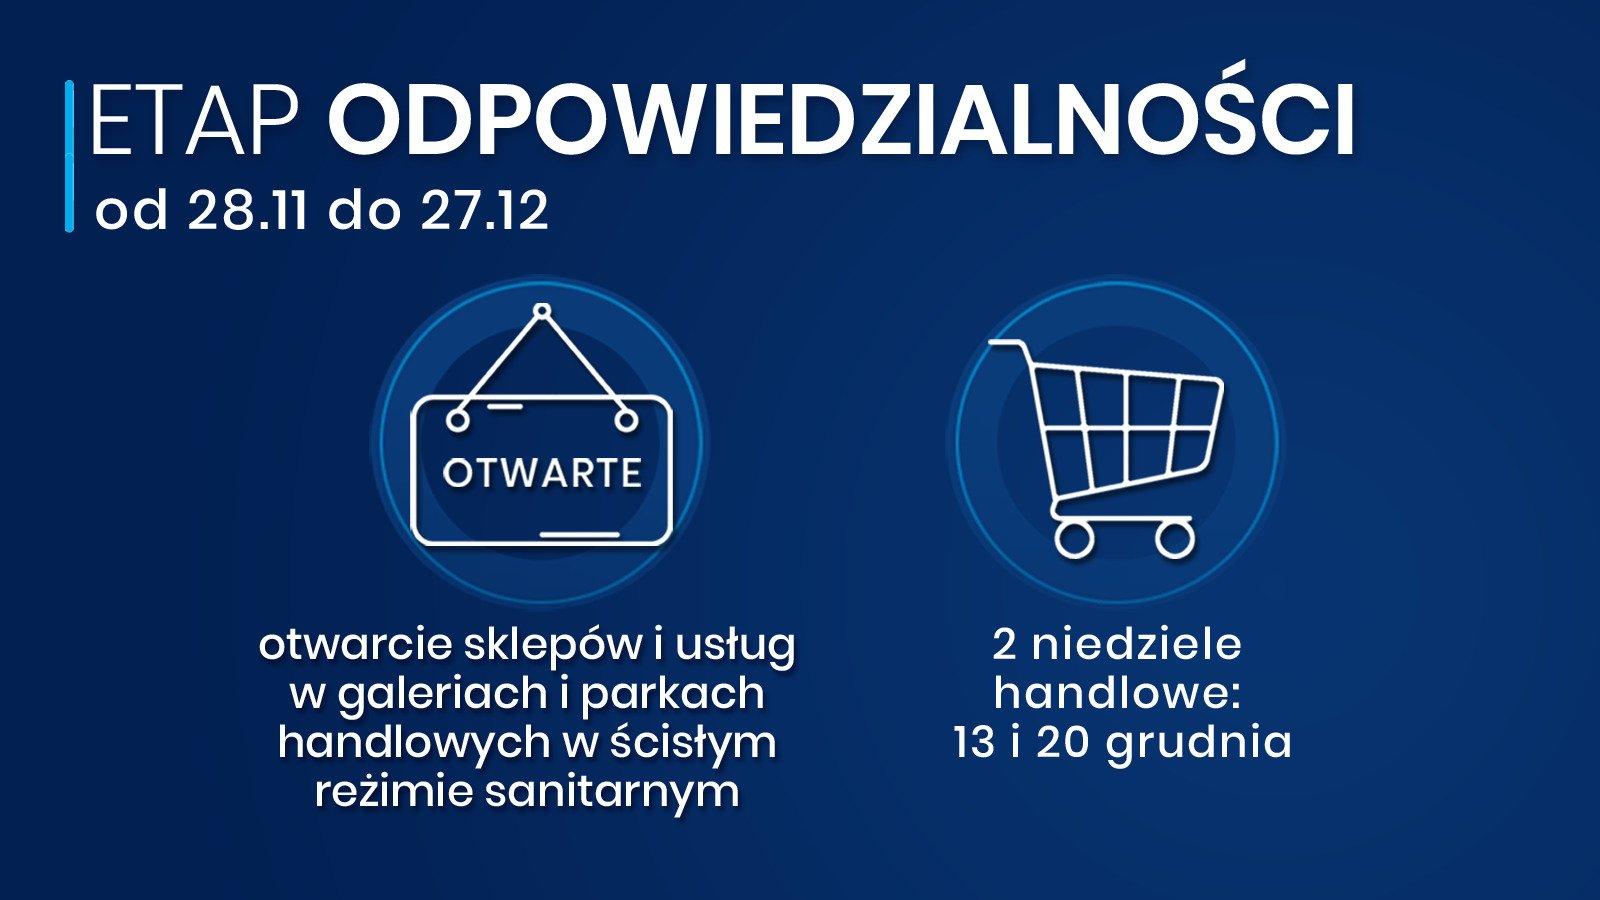 enviicgwmaeo2ha Morawiecki: Otwarcie placówek handlowych